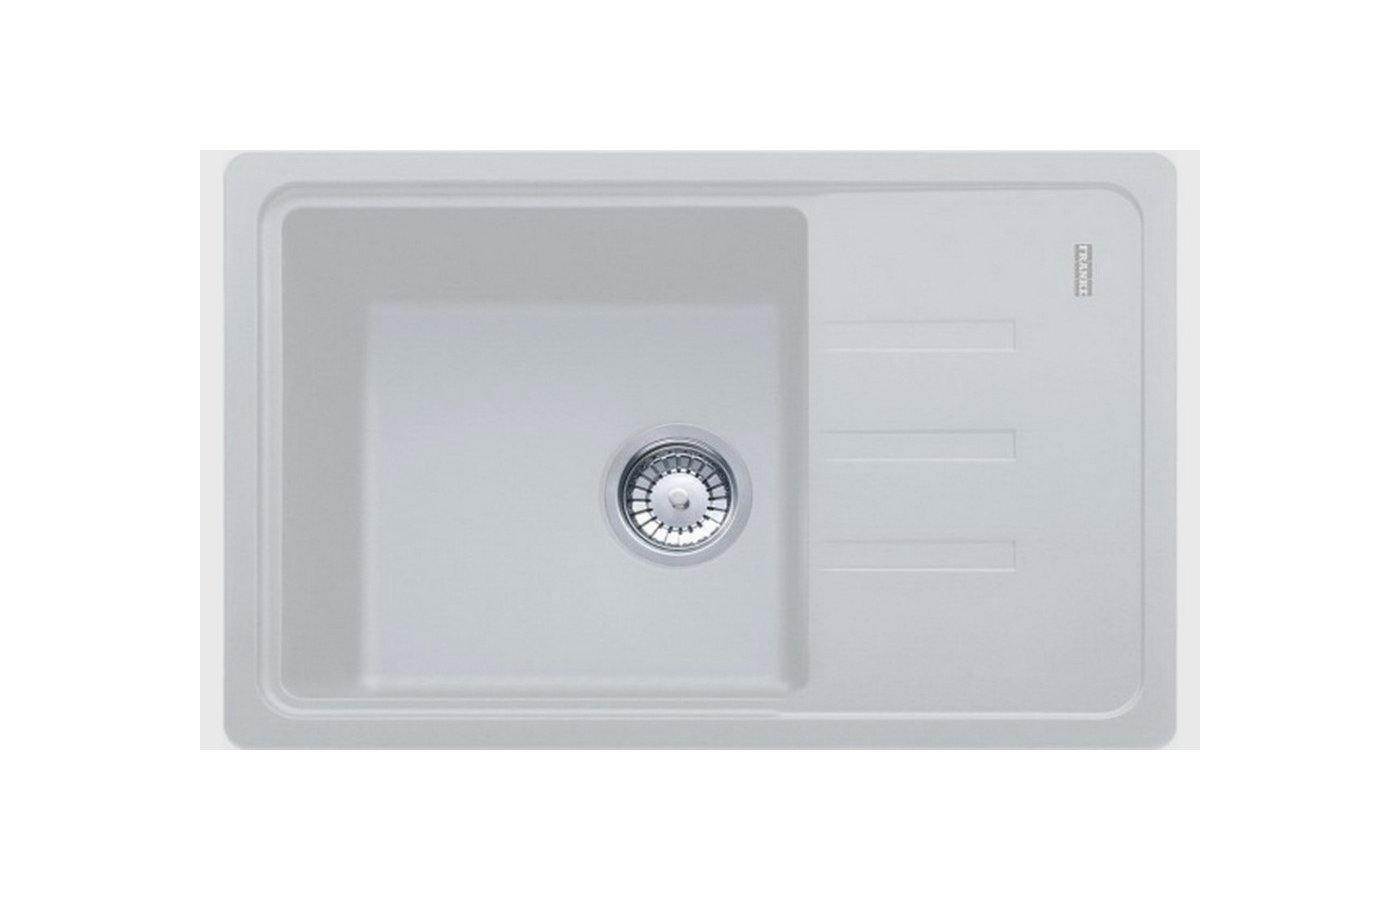 Кухонная мойка FRANKE BSG 611-62 серебро